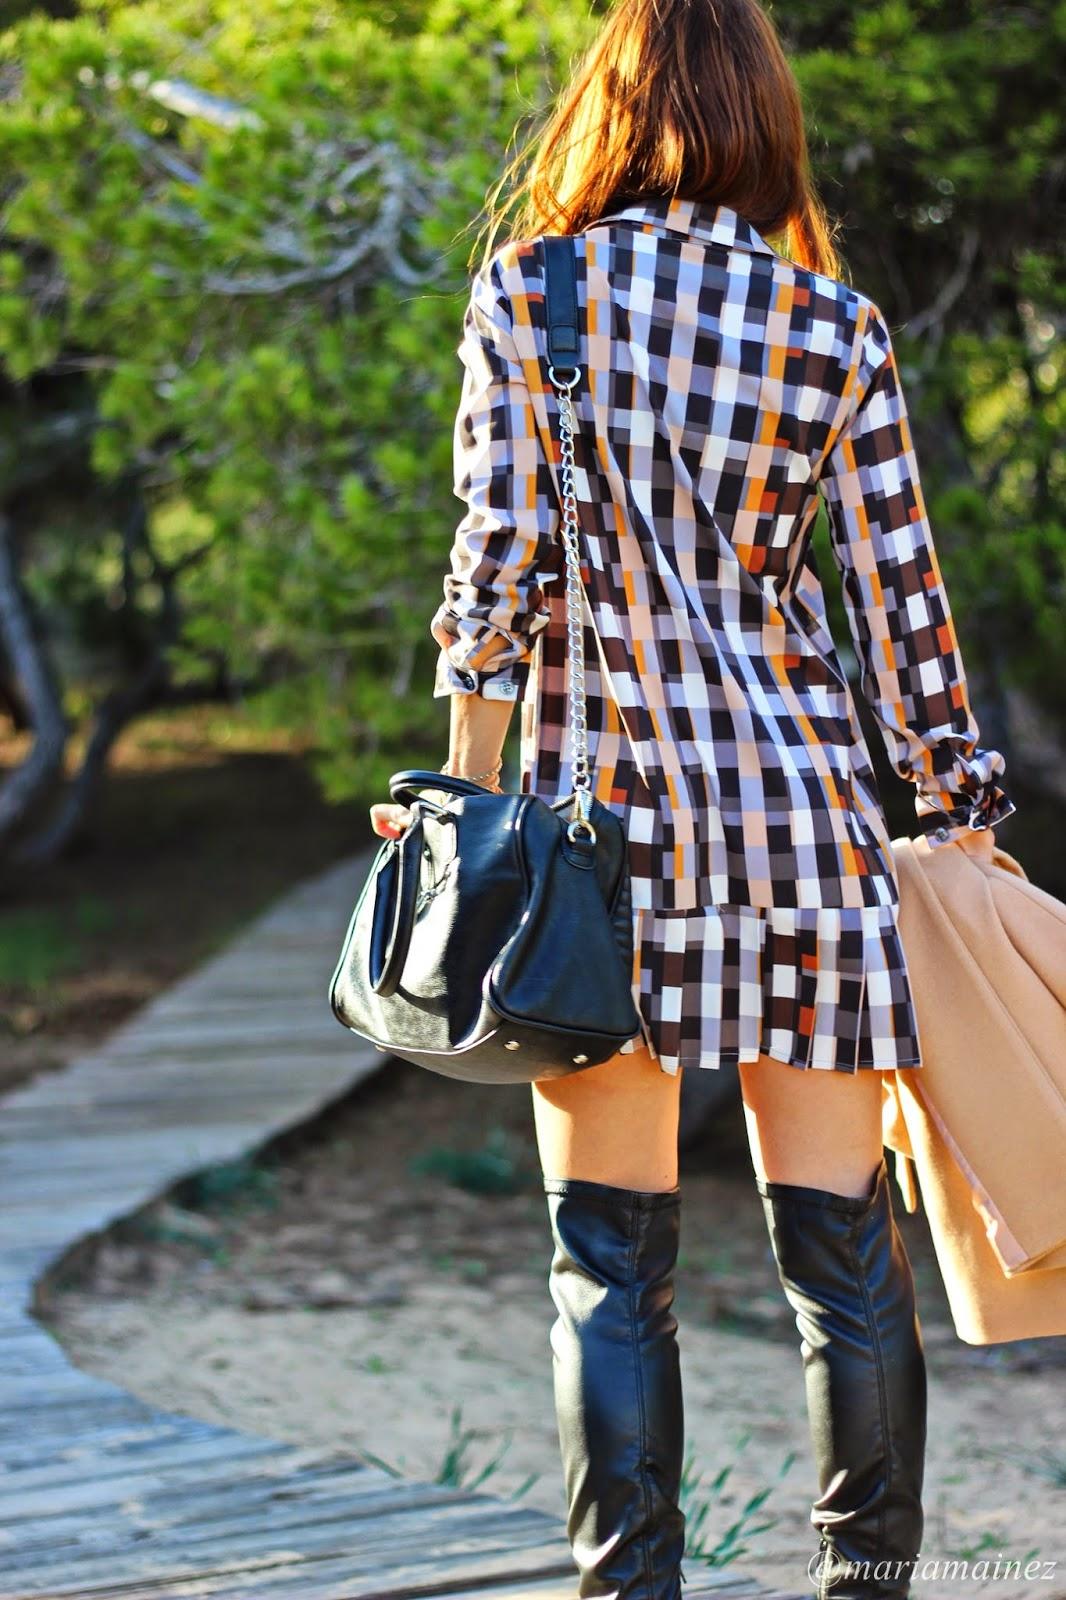 Vestido camisero- botas altas - denny rose- Opposit sunnies - blogger alicante